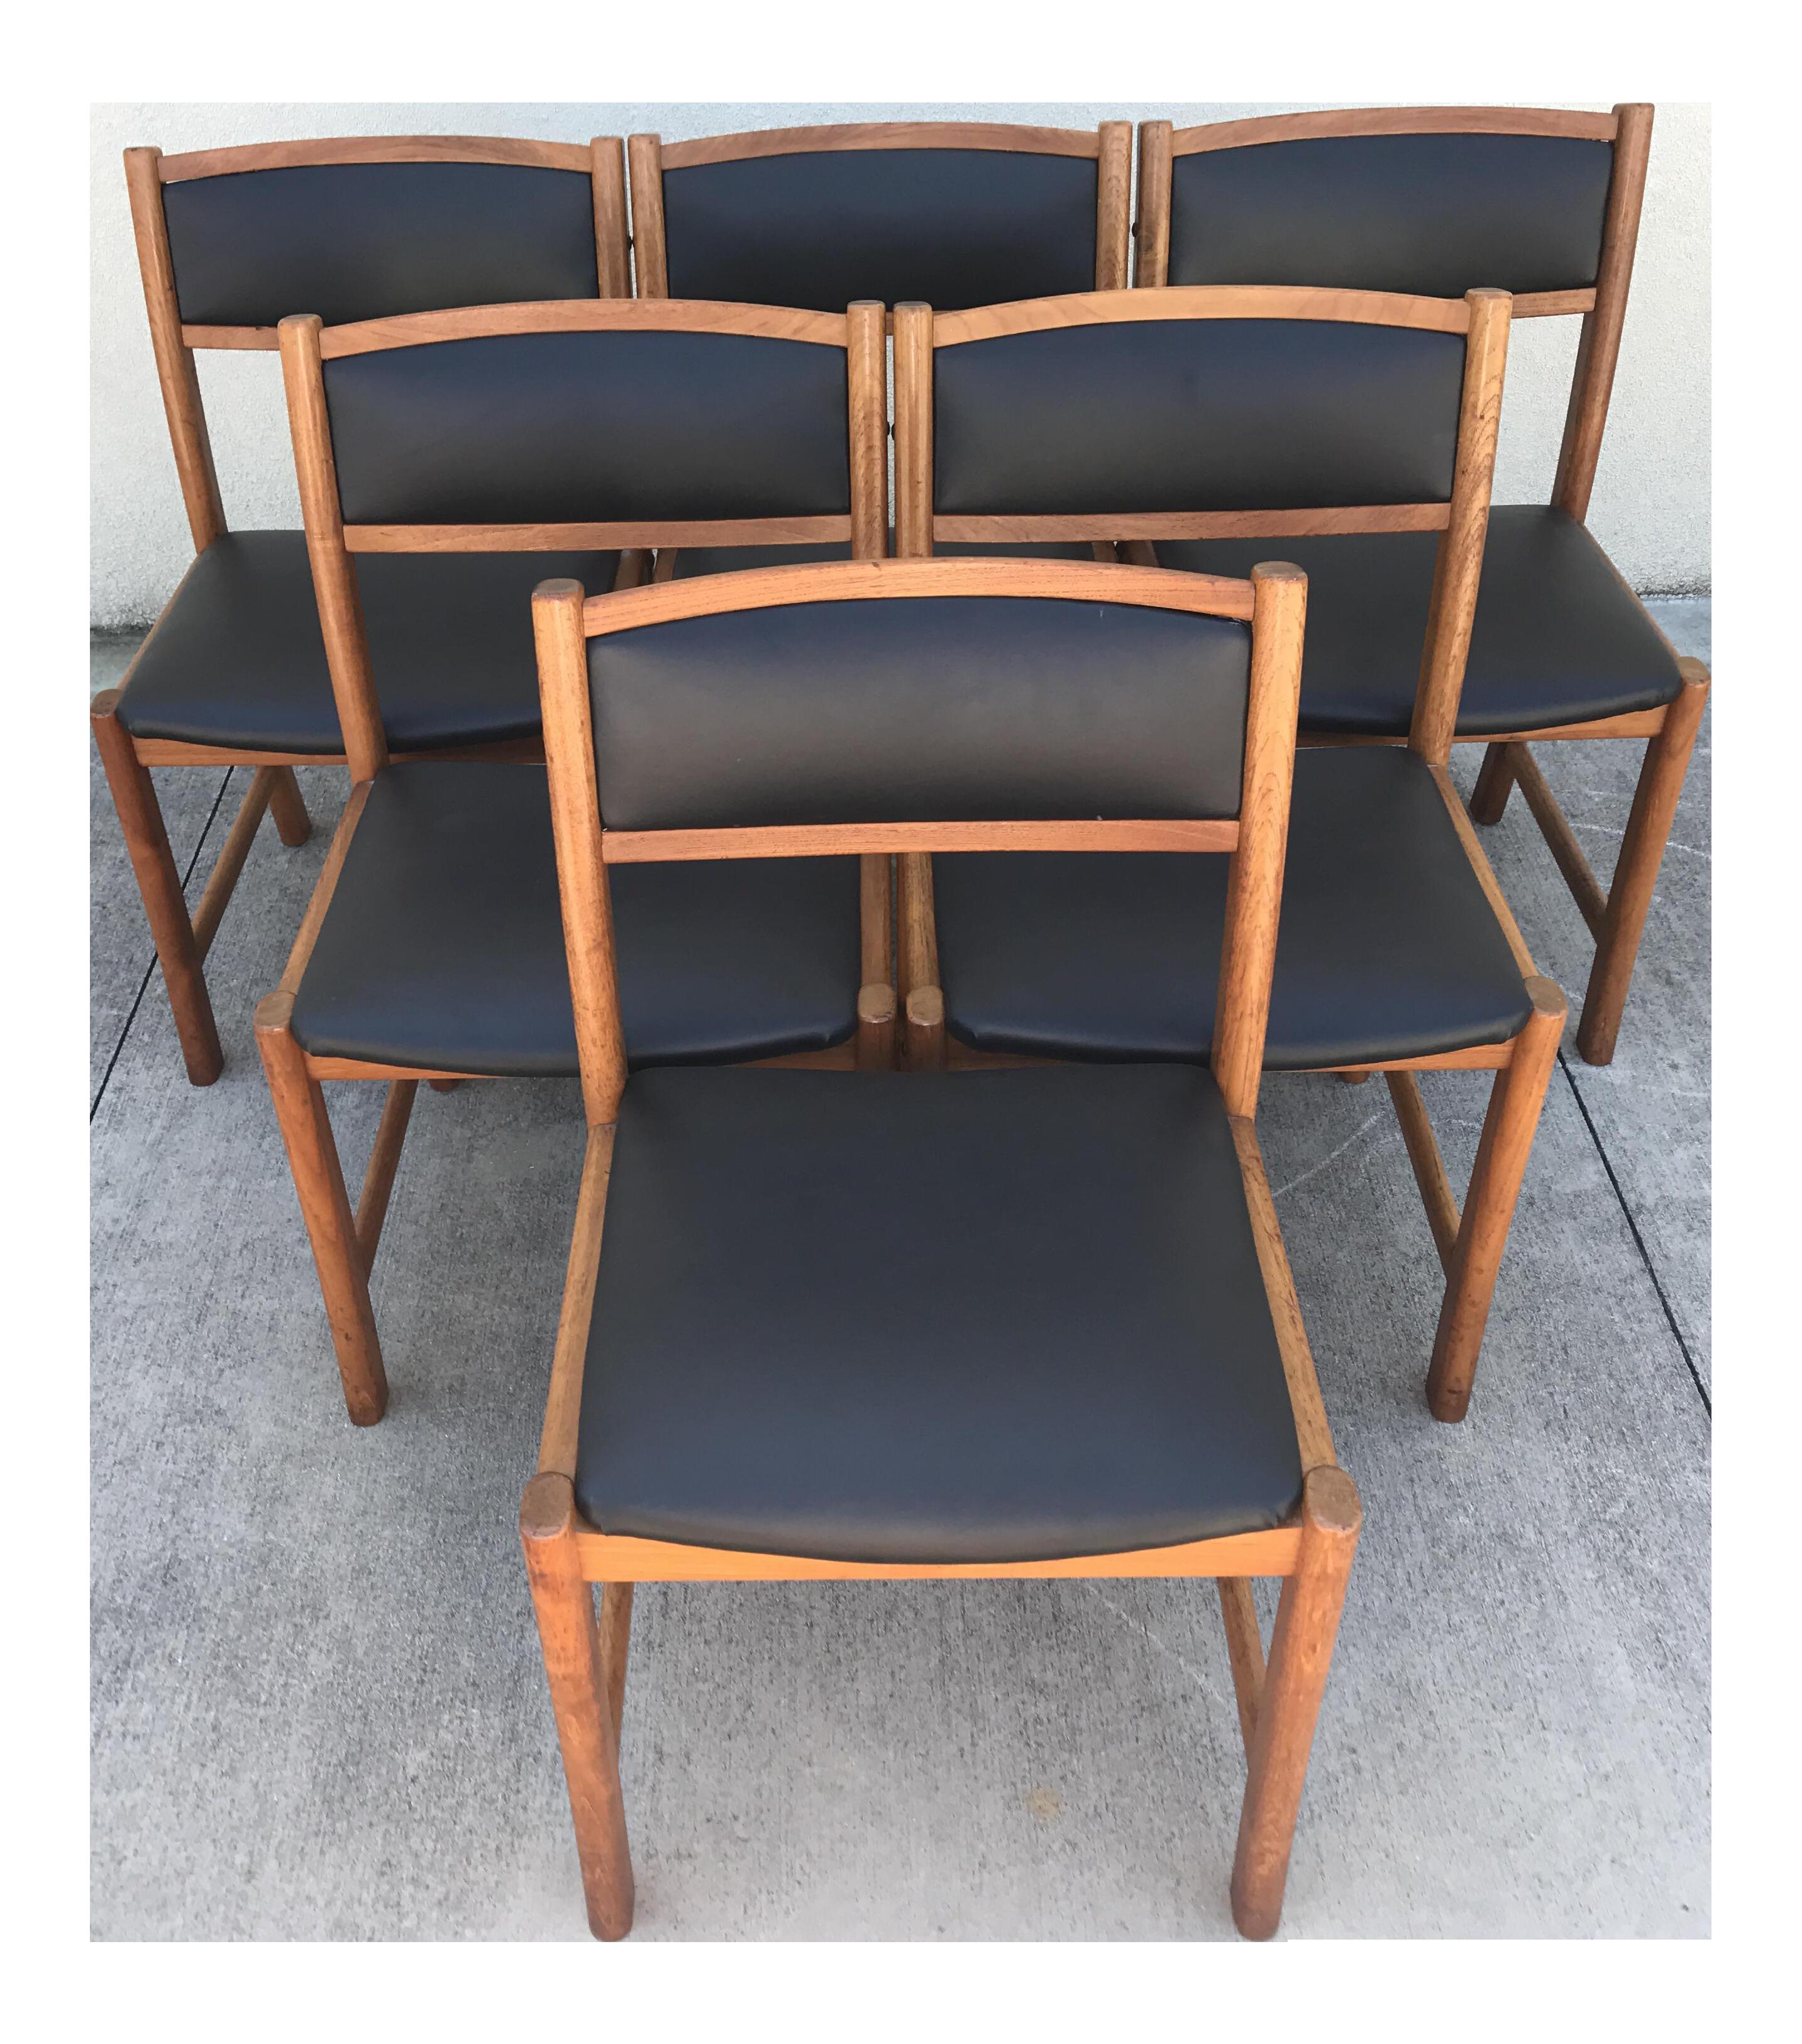 Danish modern teak dining chairs set of 6 chairish for Modern dining chairs ireland